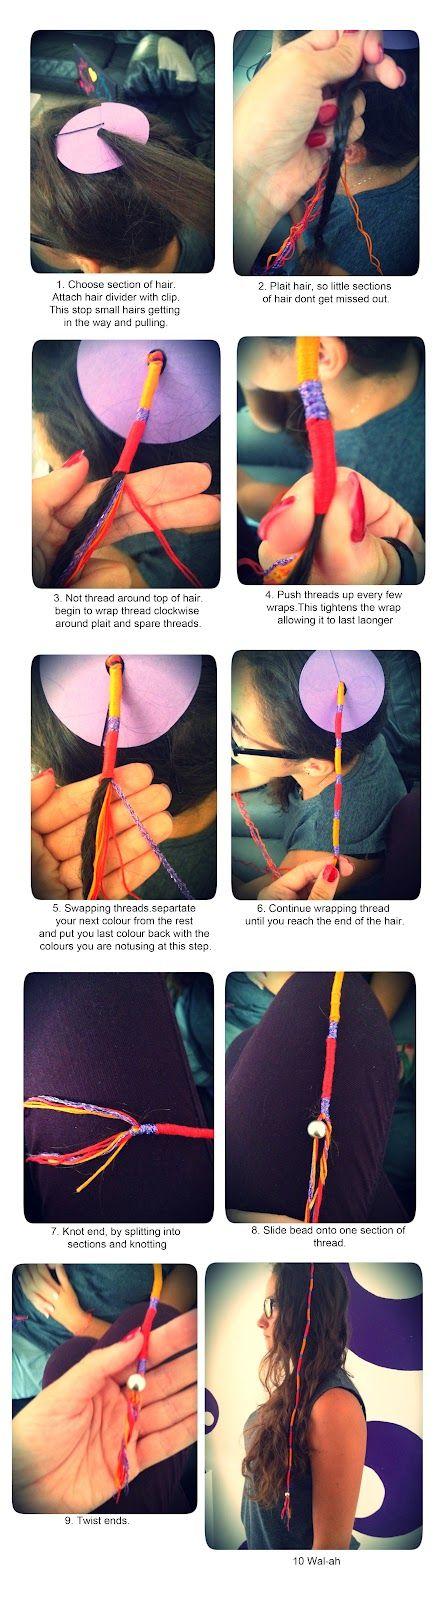 1) Embroidery Thread  2) Hair Divider  3) Scissors  4) Clip  5) Comb